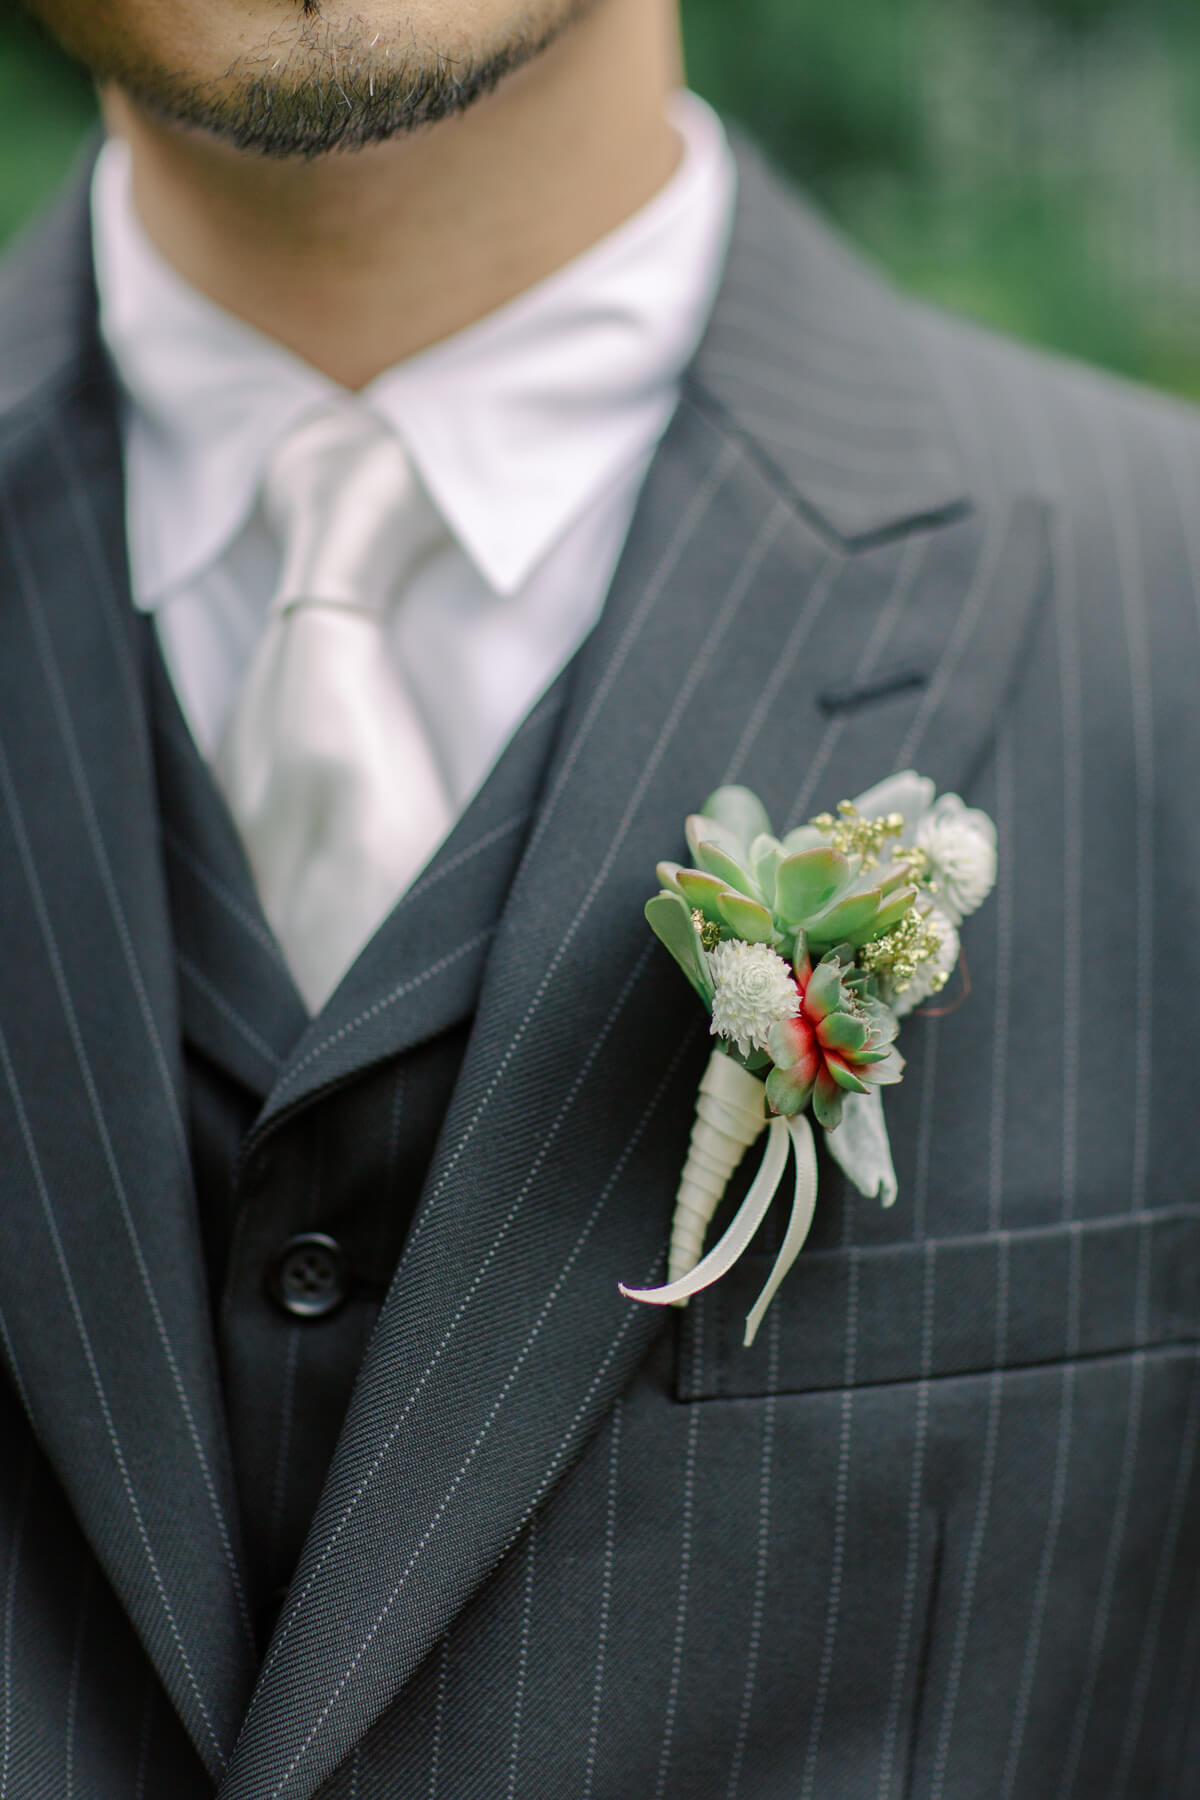 nikkiloveu-hongkong-weddingday-theupperhouse-as-023.jpg